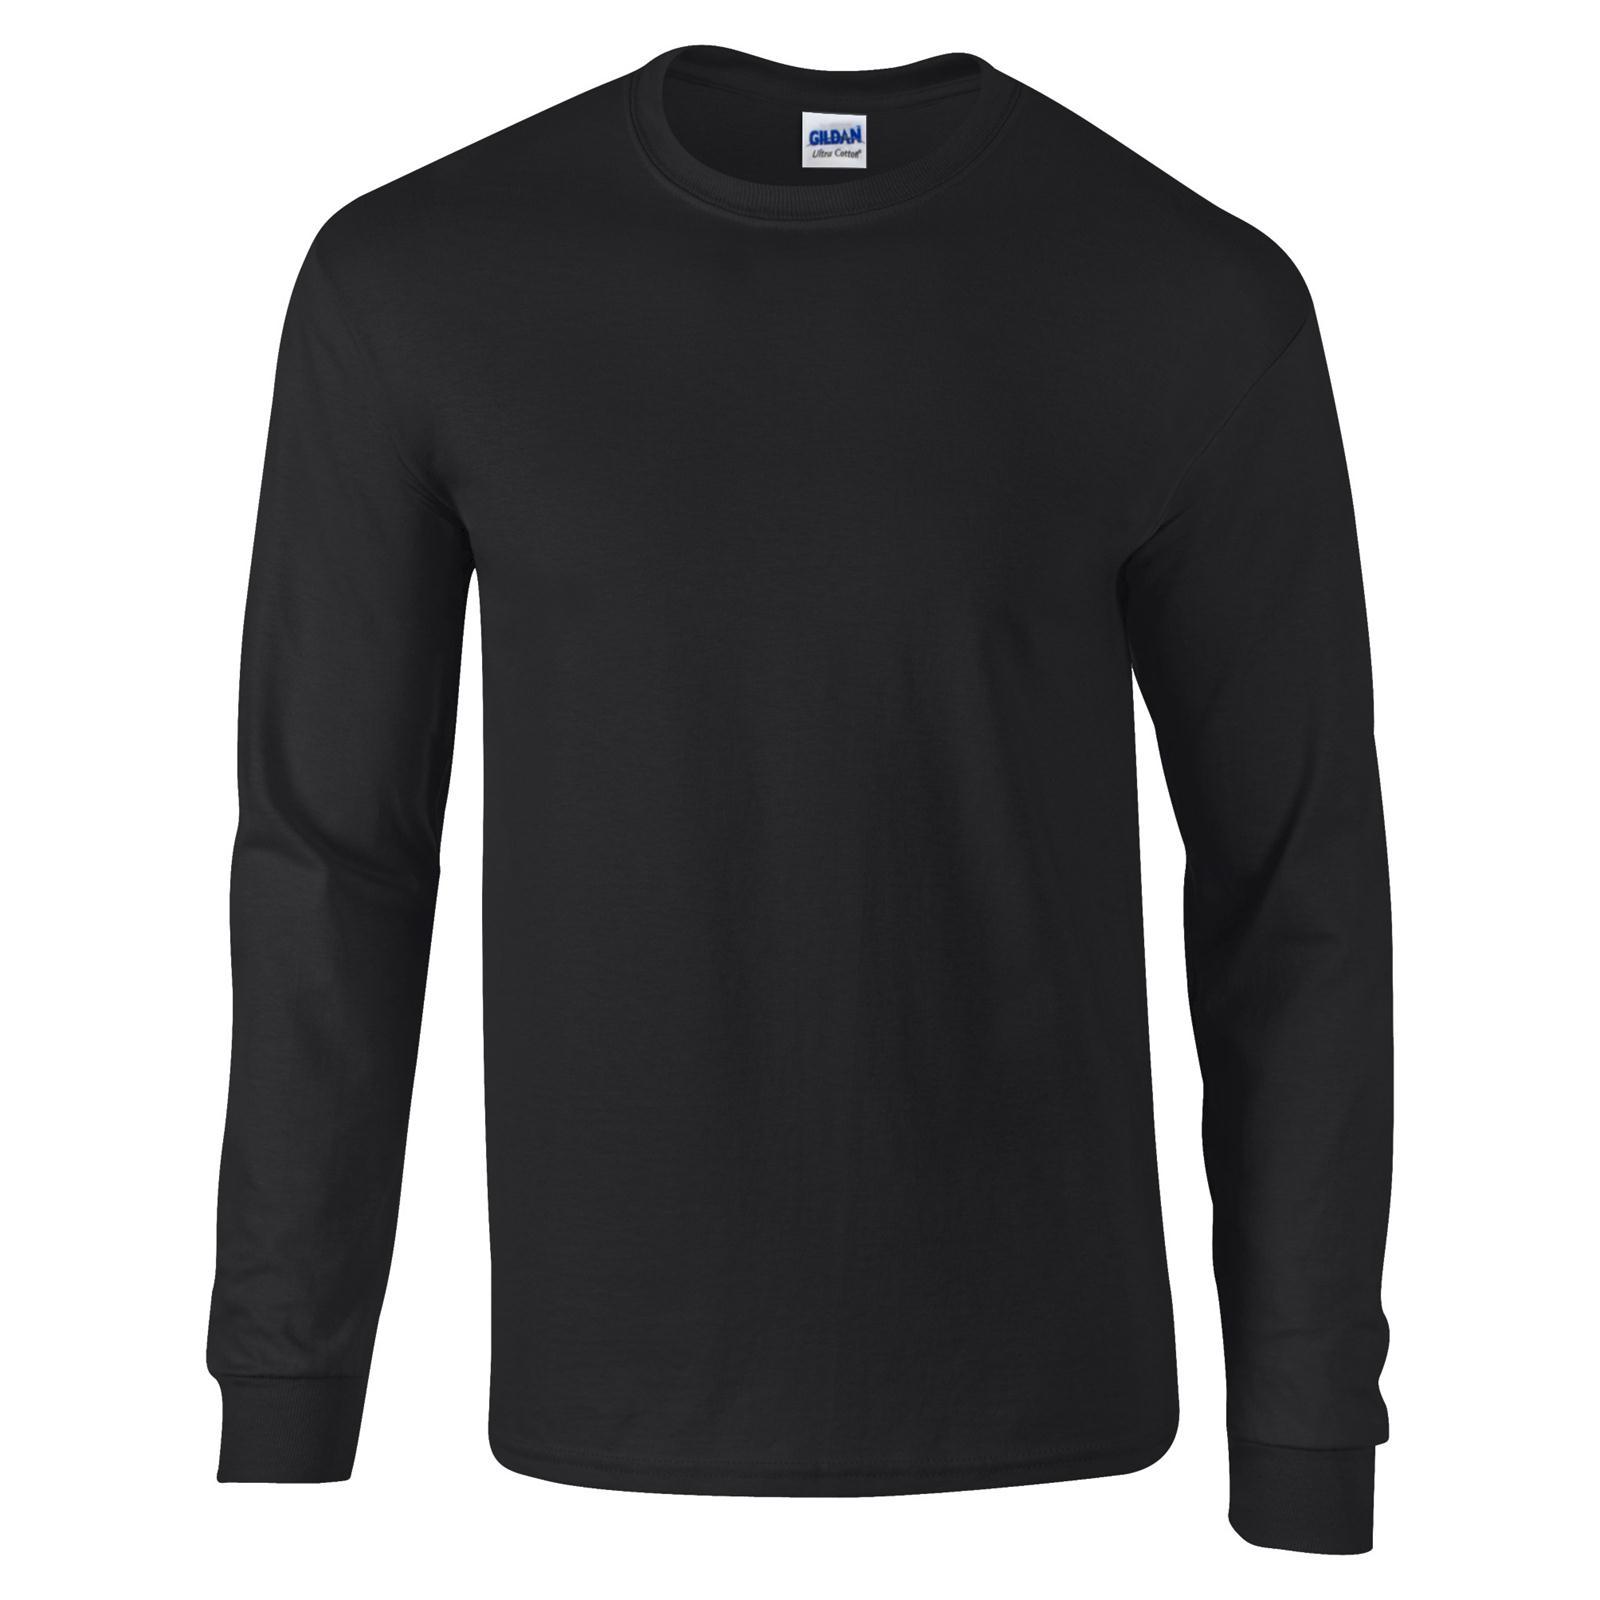 New gildan unisex adults ultra cotton long sleeve crew t for Best full sleeve t shirts